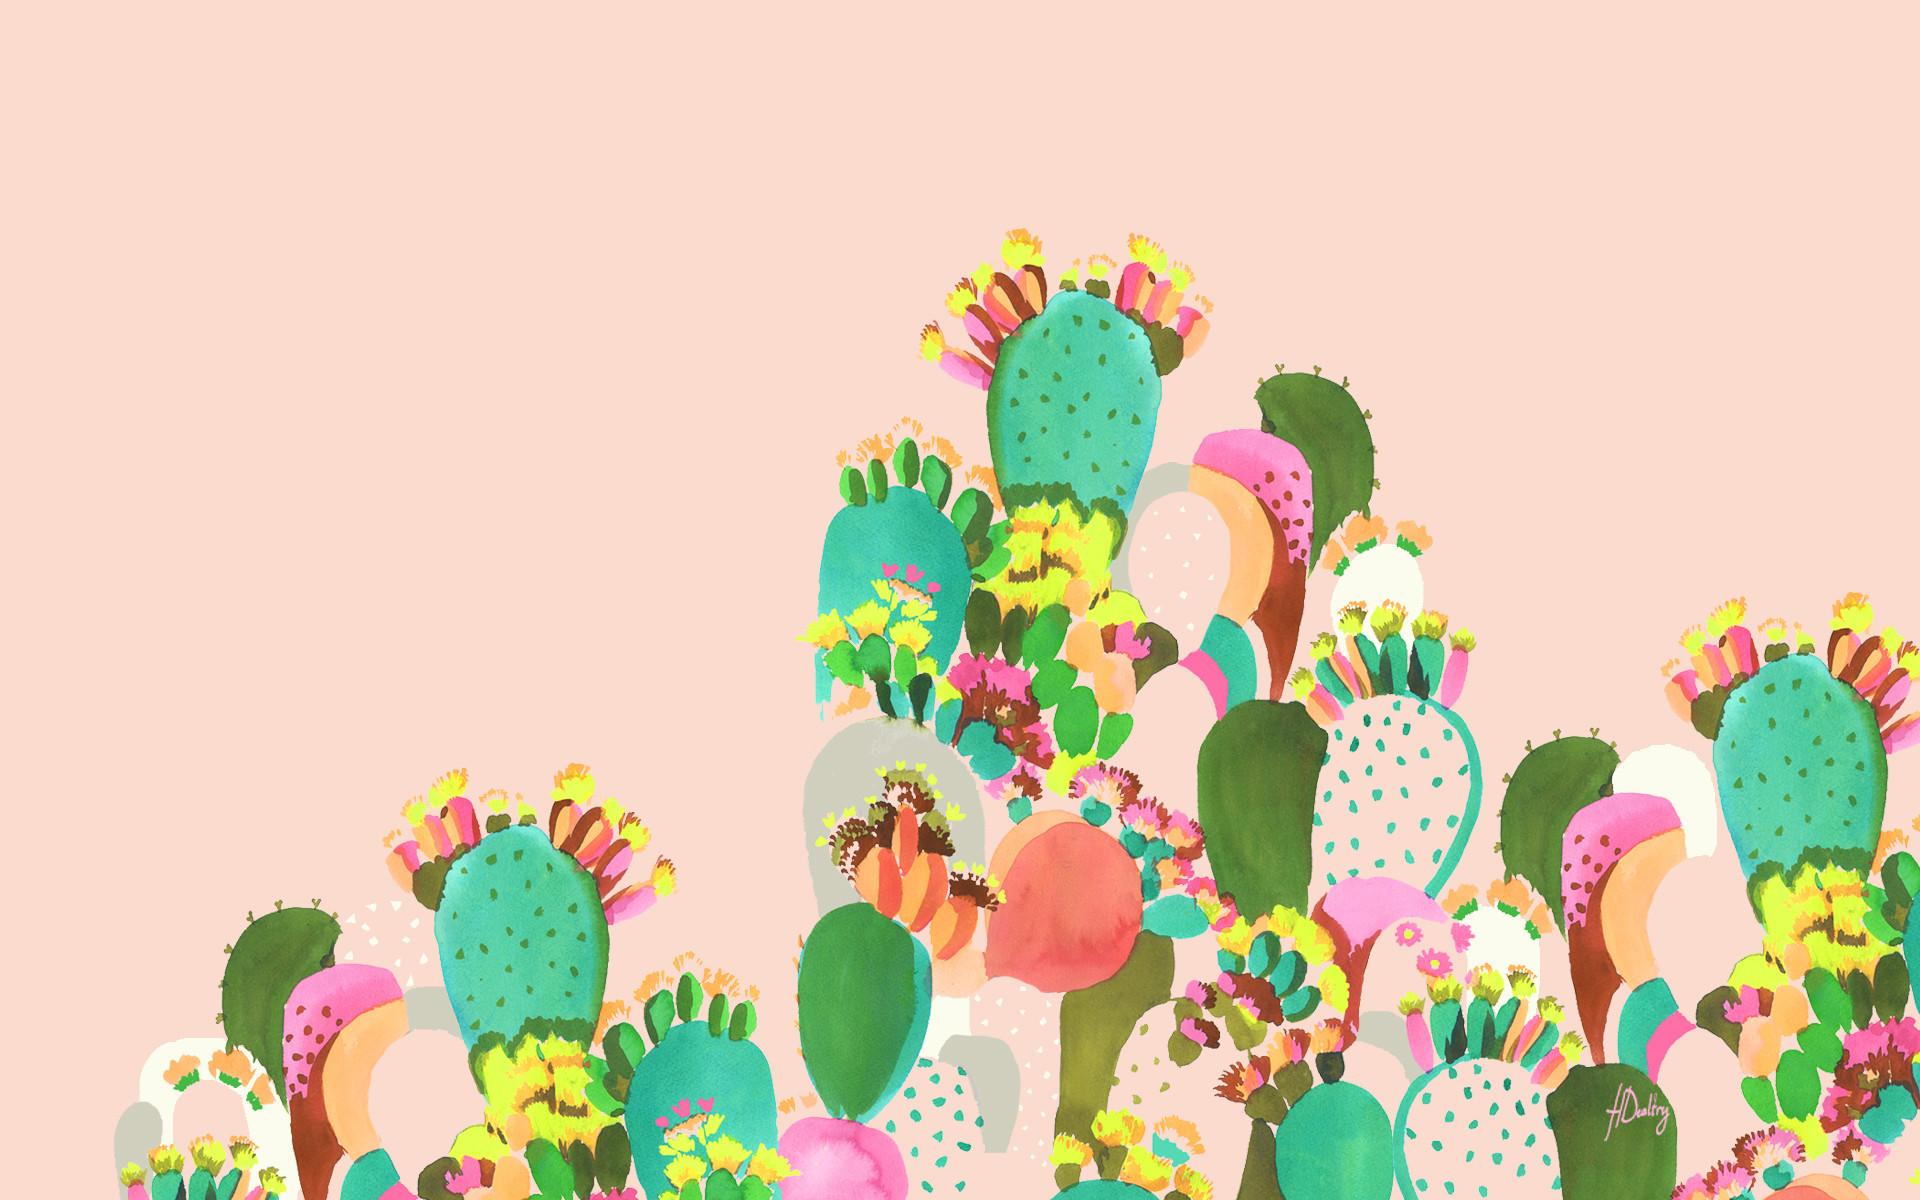 Kate Spade Desktop Wallpaper 2018 45 Images